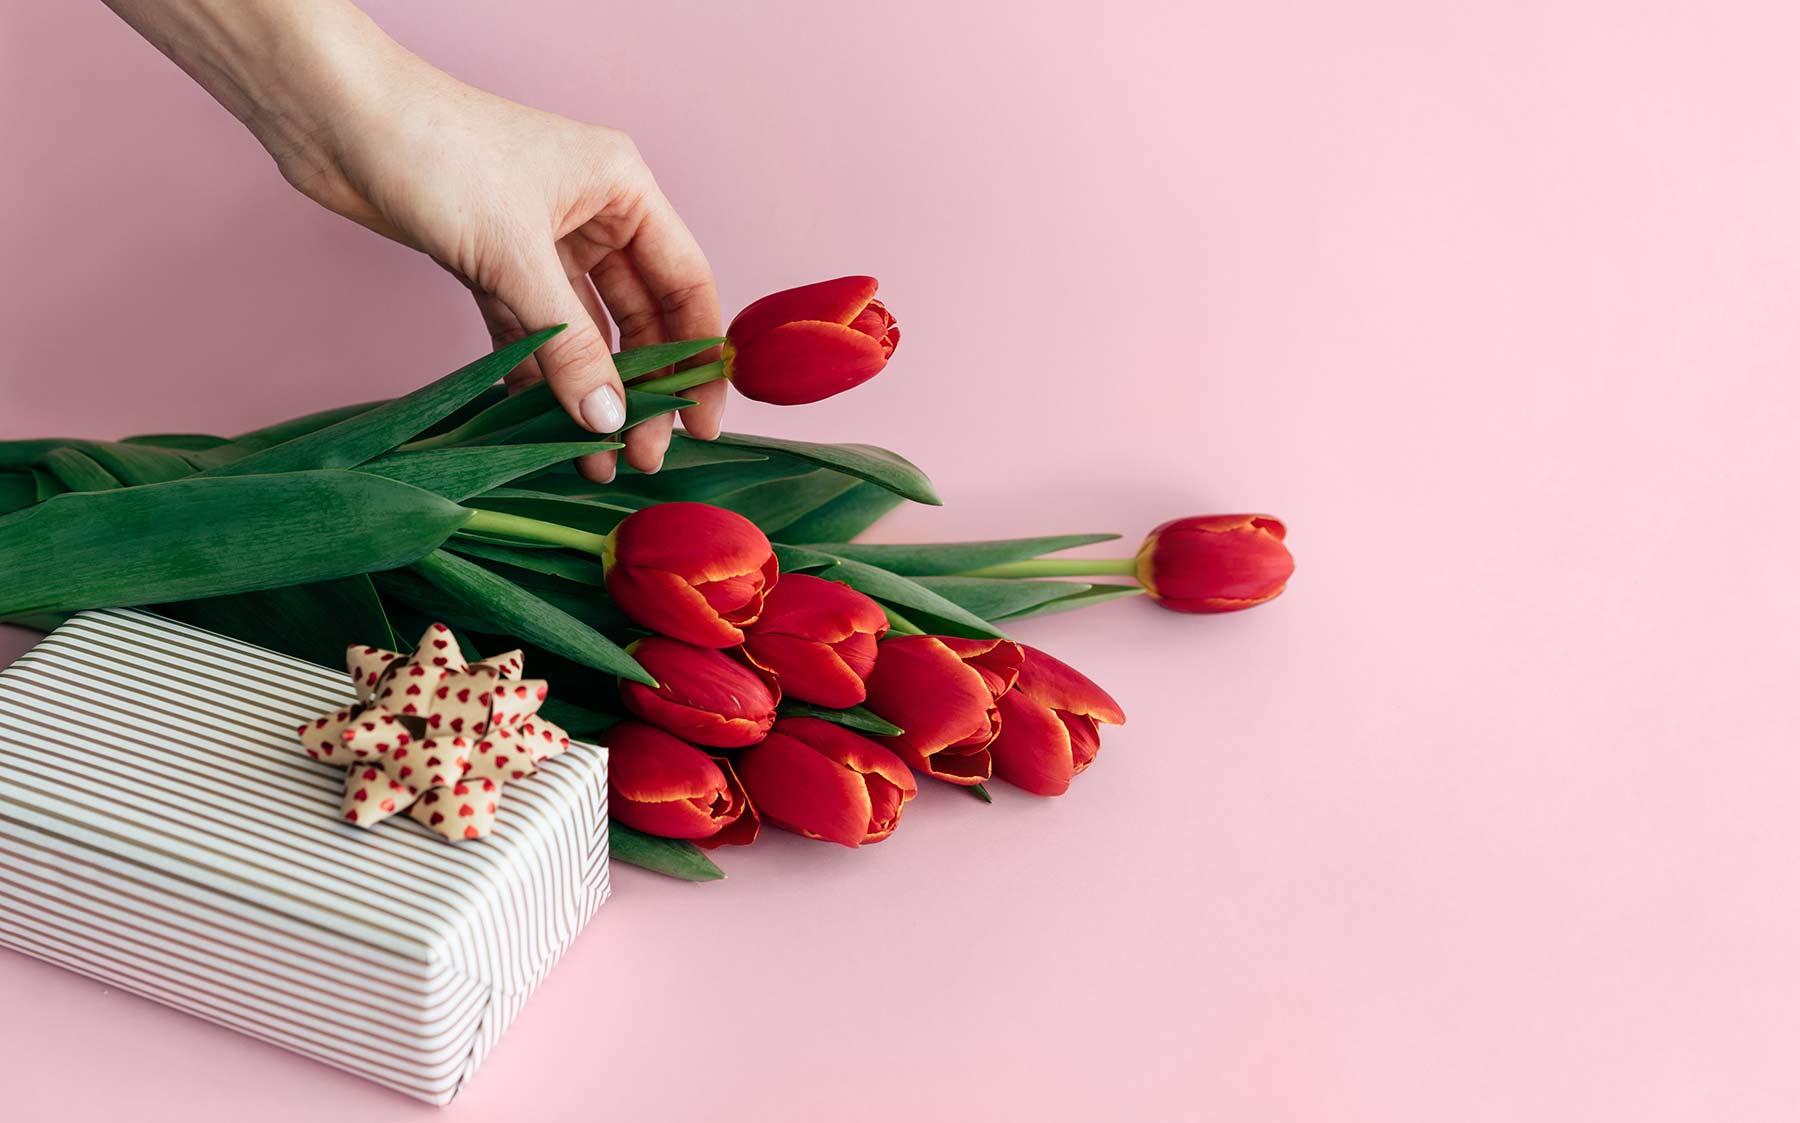 flora-urban-jungle-madrid-flores-a-domicilio-ramos-de-novias